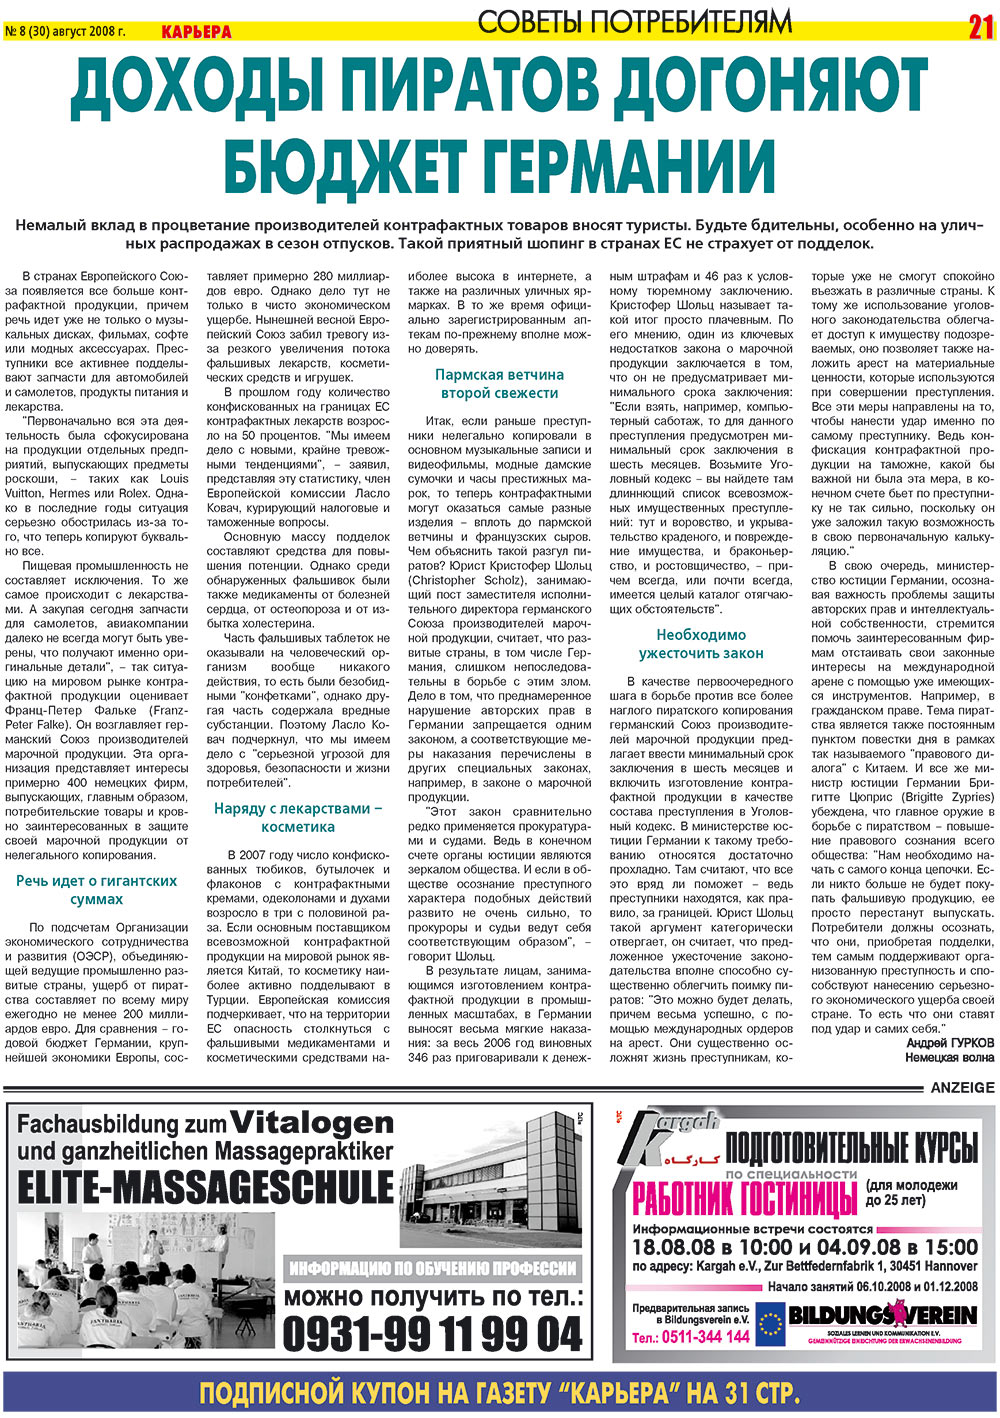 Карьера (газета). 2008 год, номер 8, стр. 21